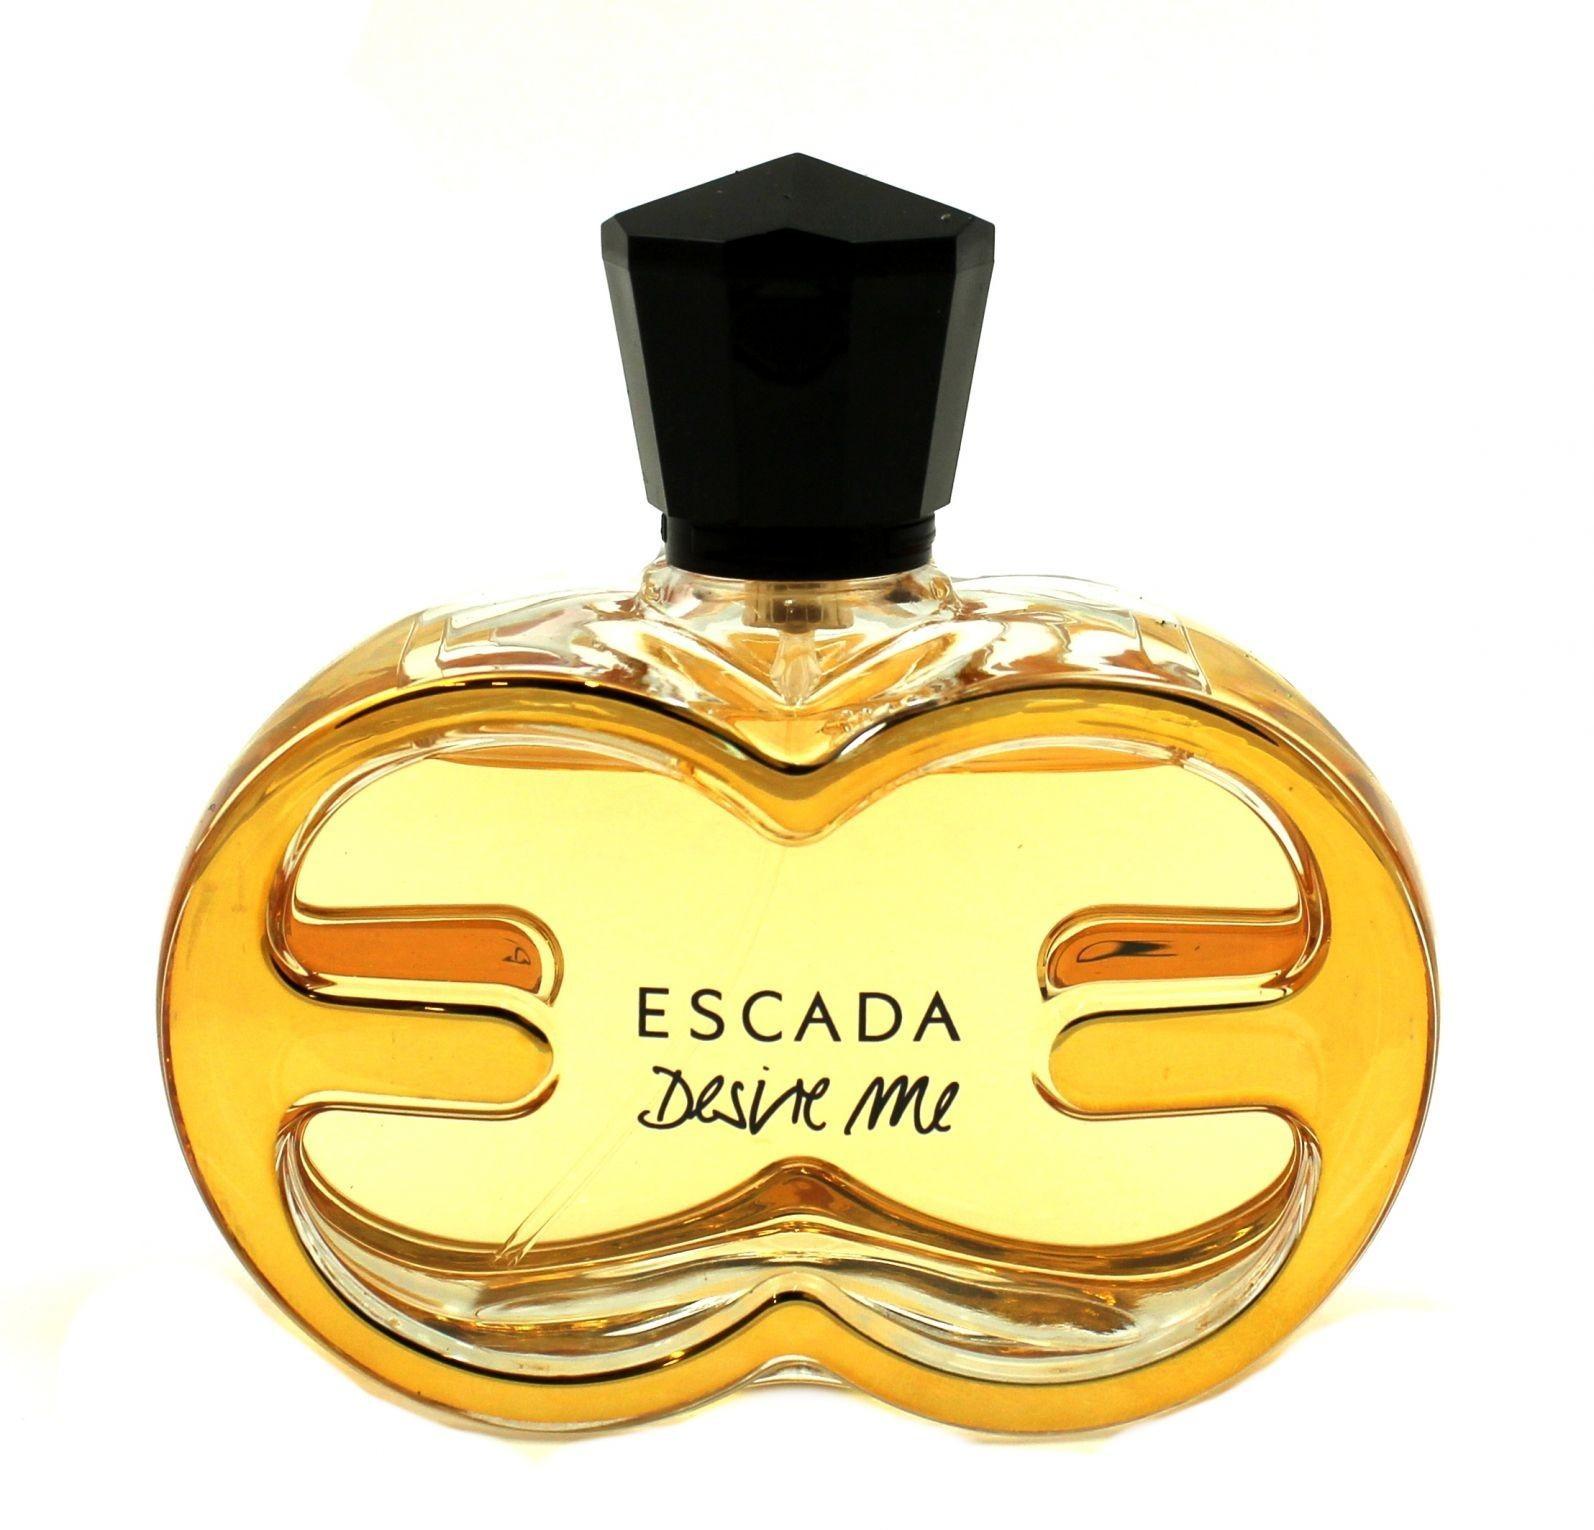 Escada Desire Me аромат для женщин